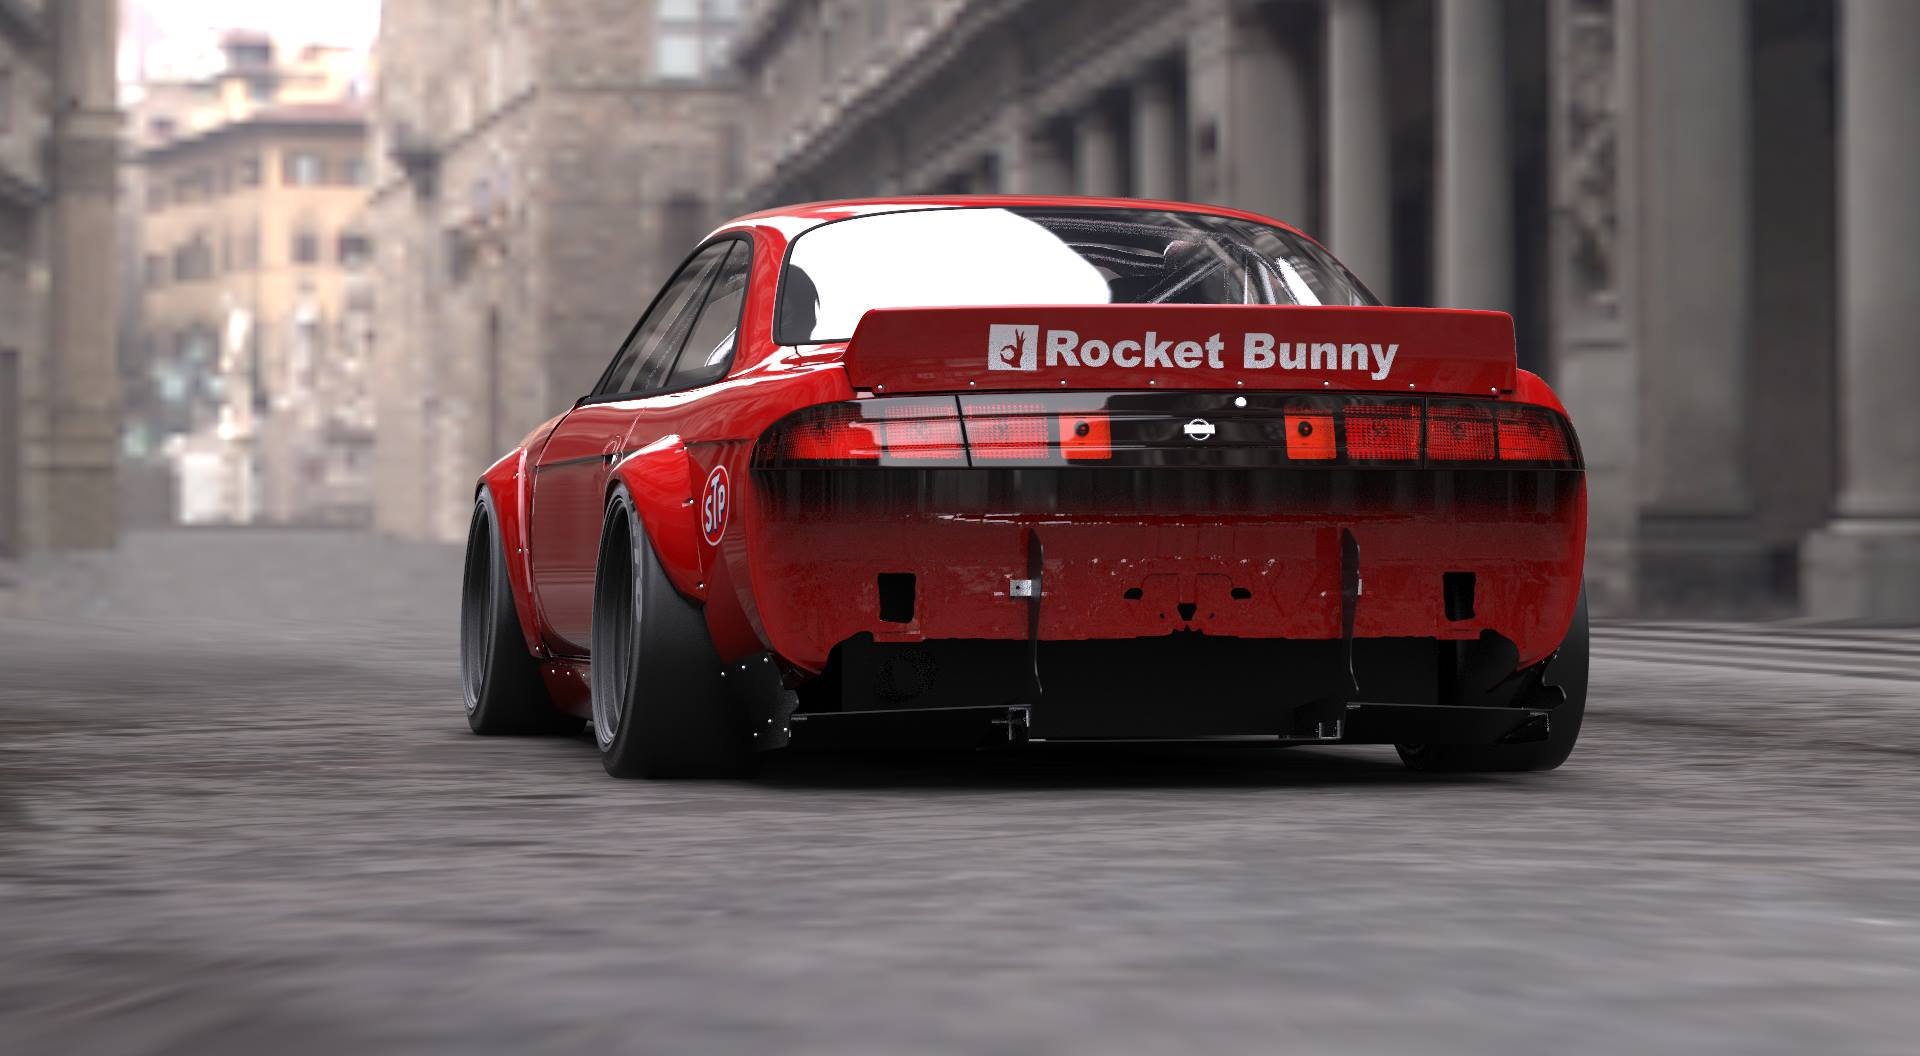 Drift Car Wallpaper Hd Rocket Bunny Body Kit Turns Your S14 Into A Plymouth Cuda